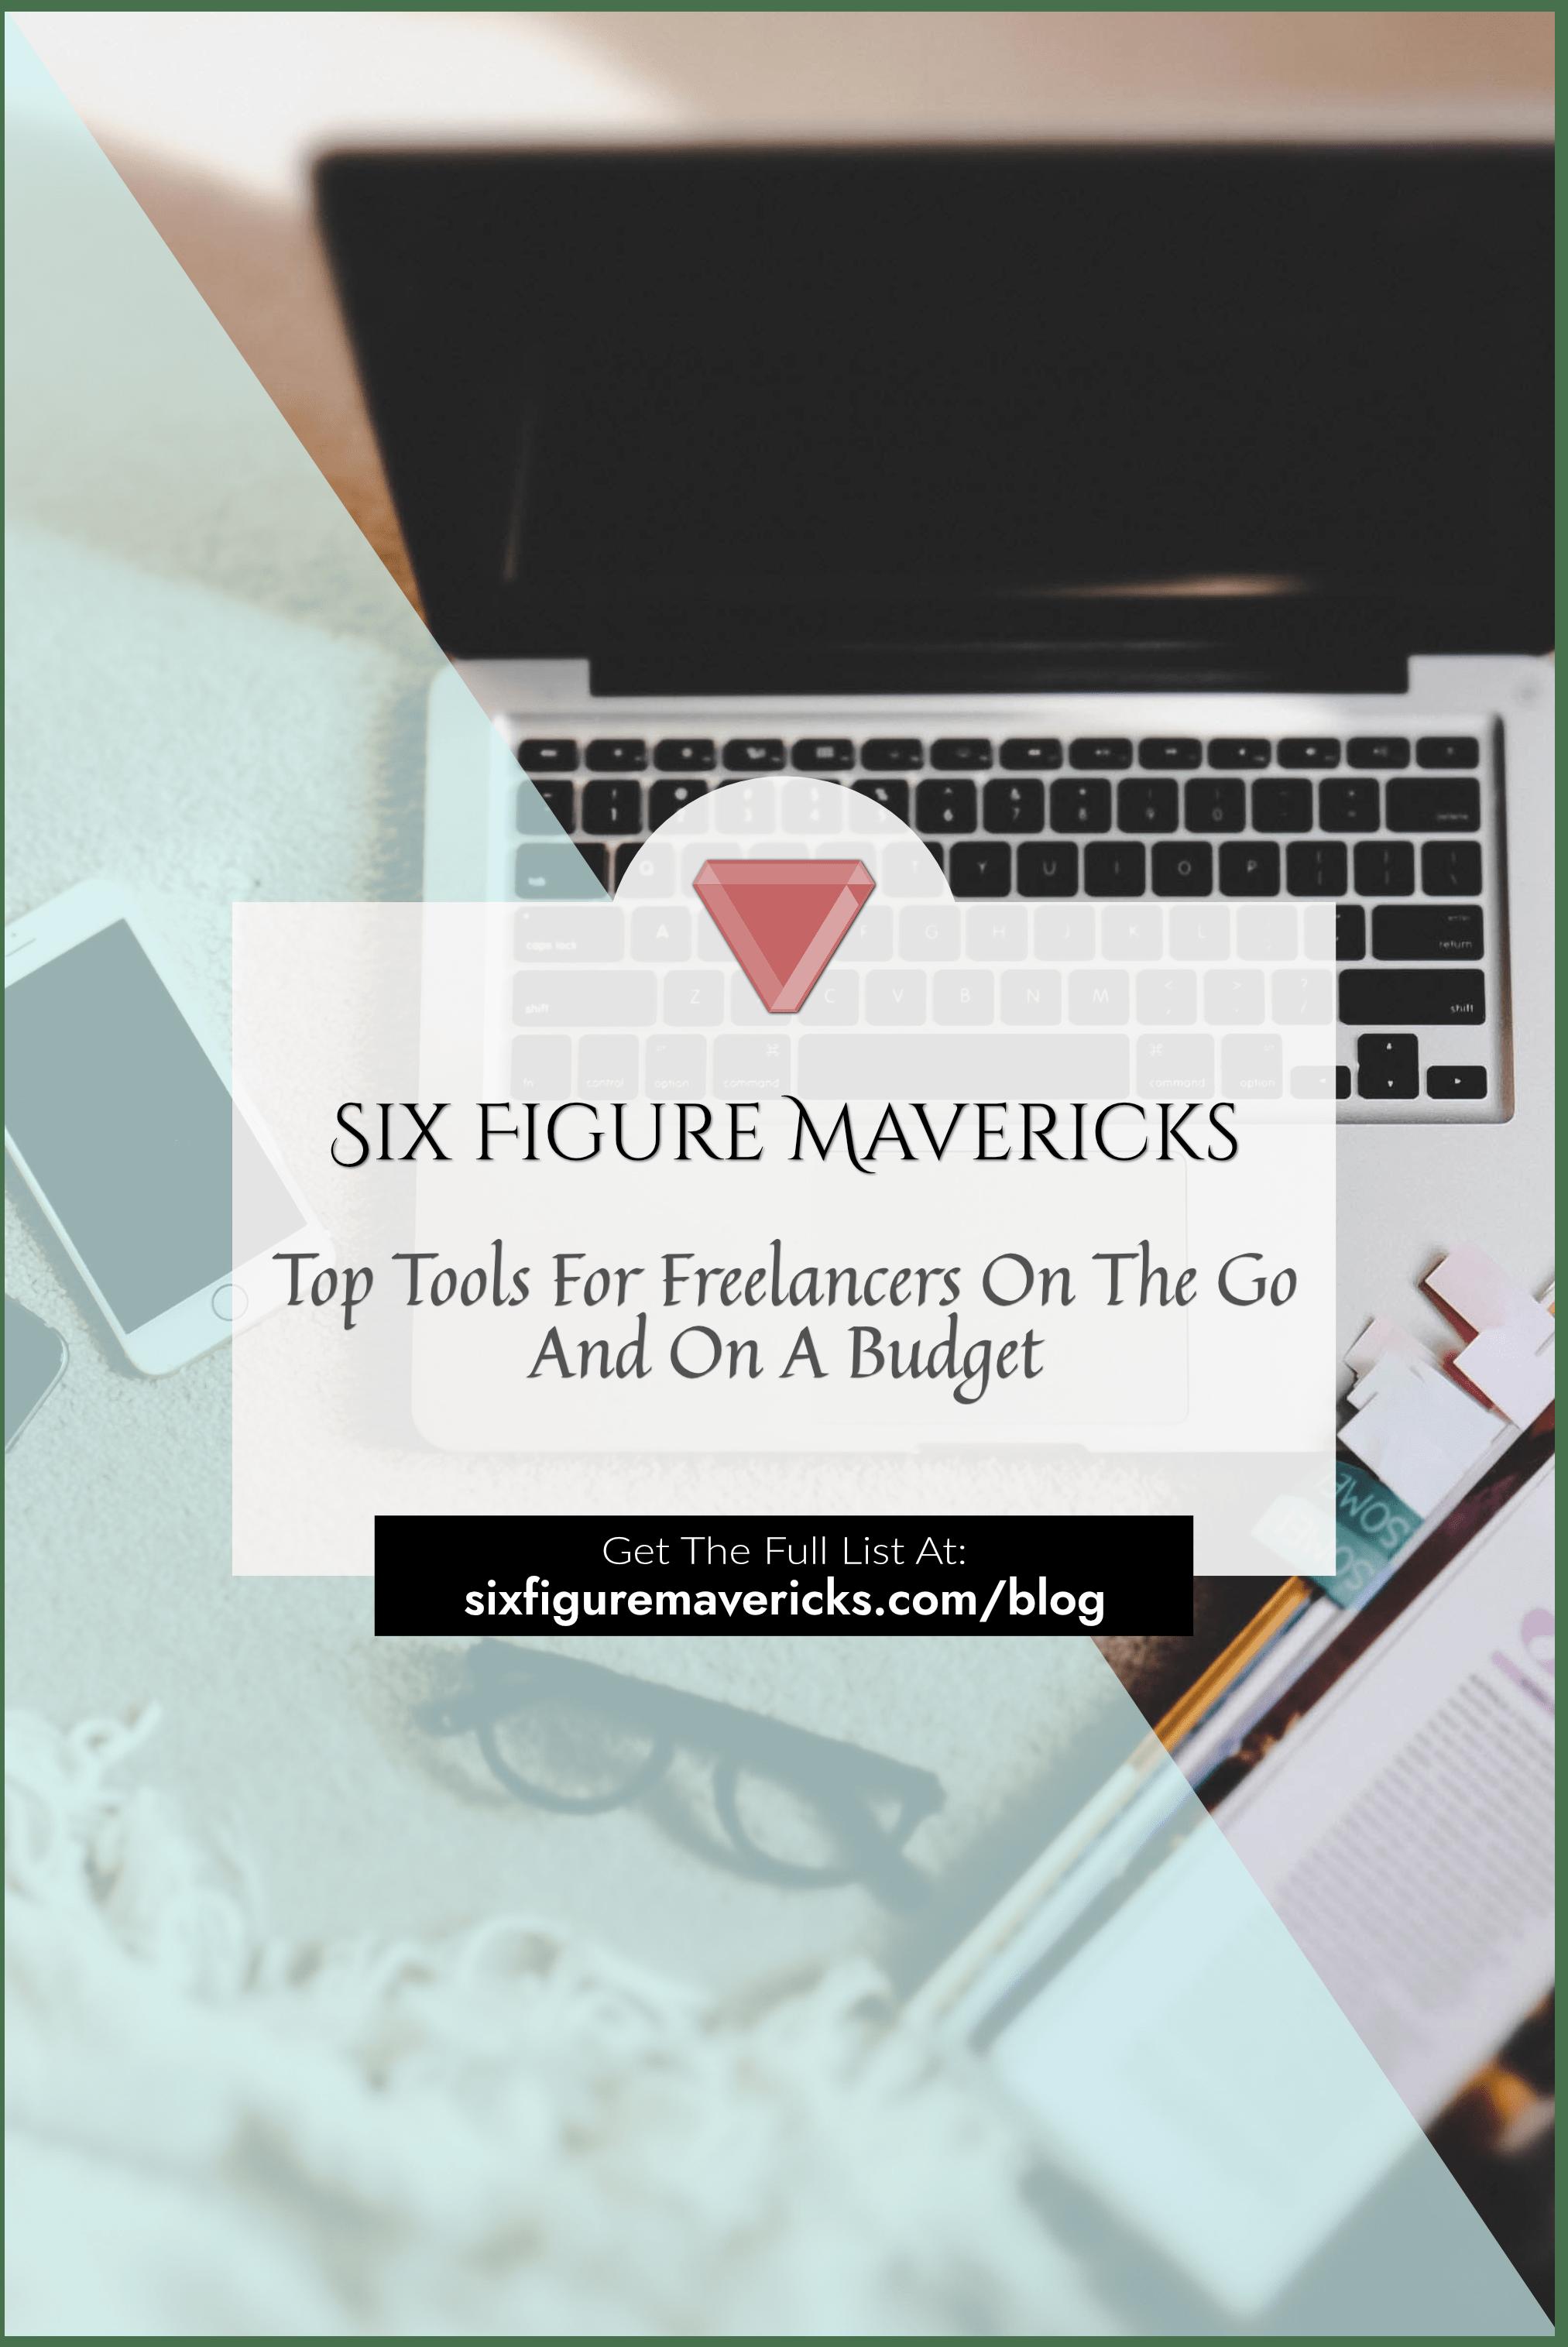 Six Figure Mavericks top tools for freelancers on a budget pin